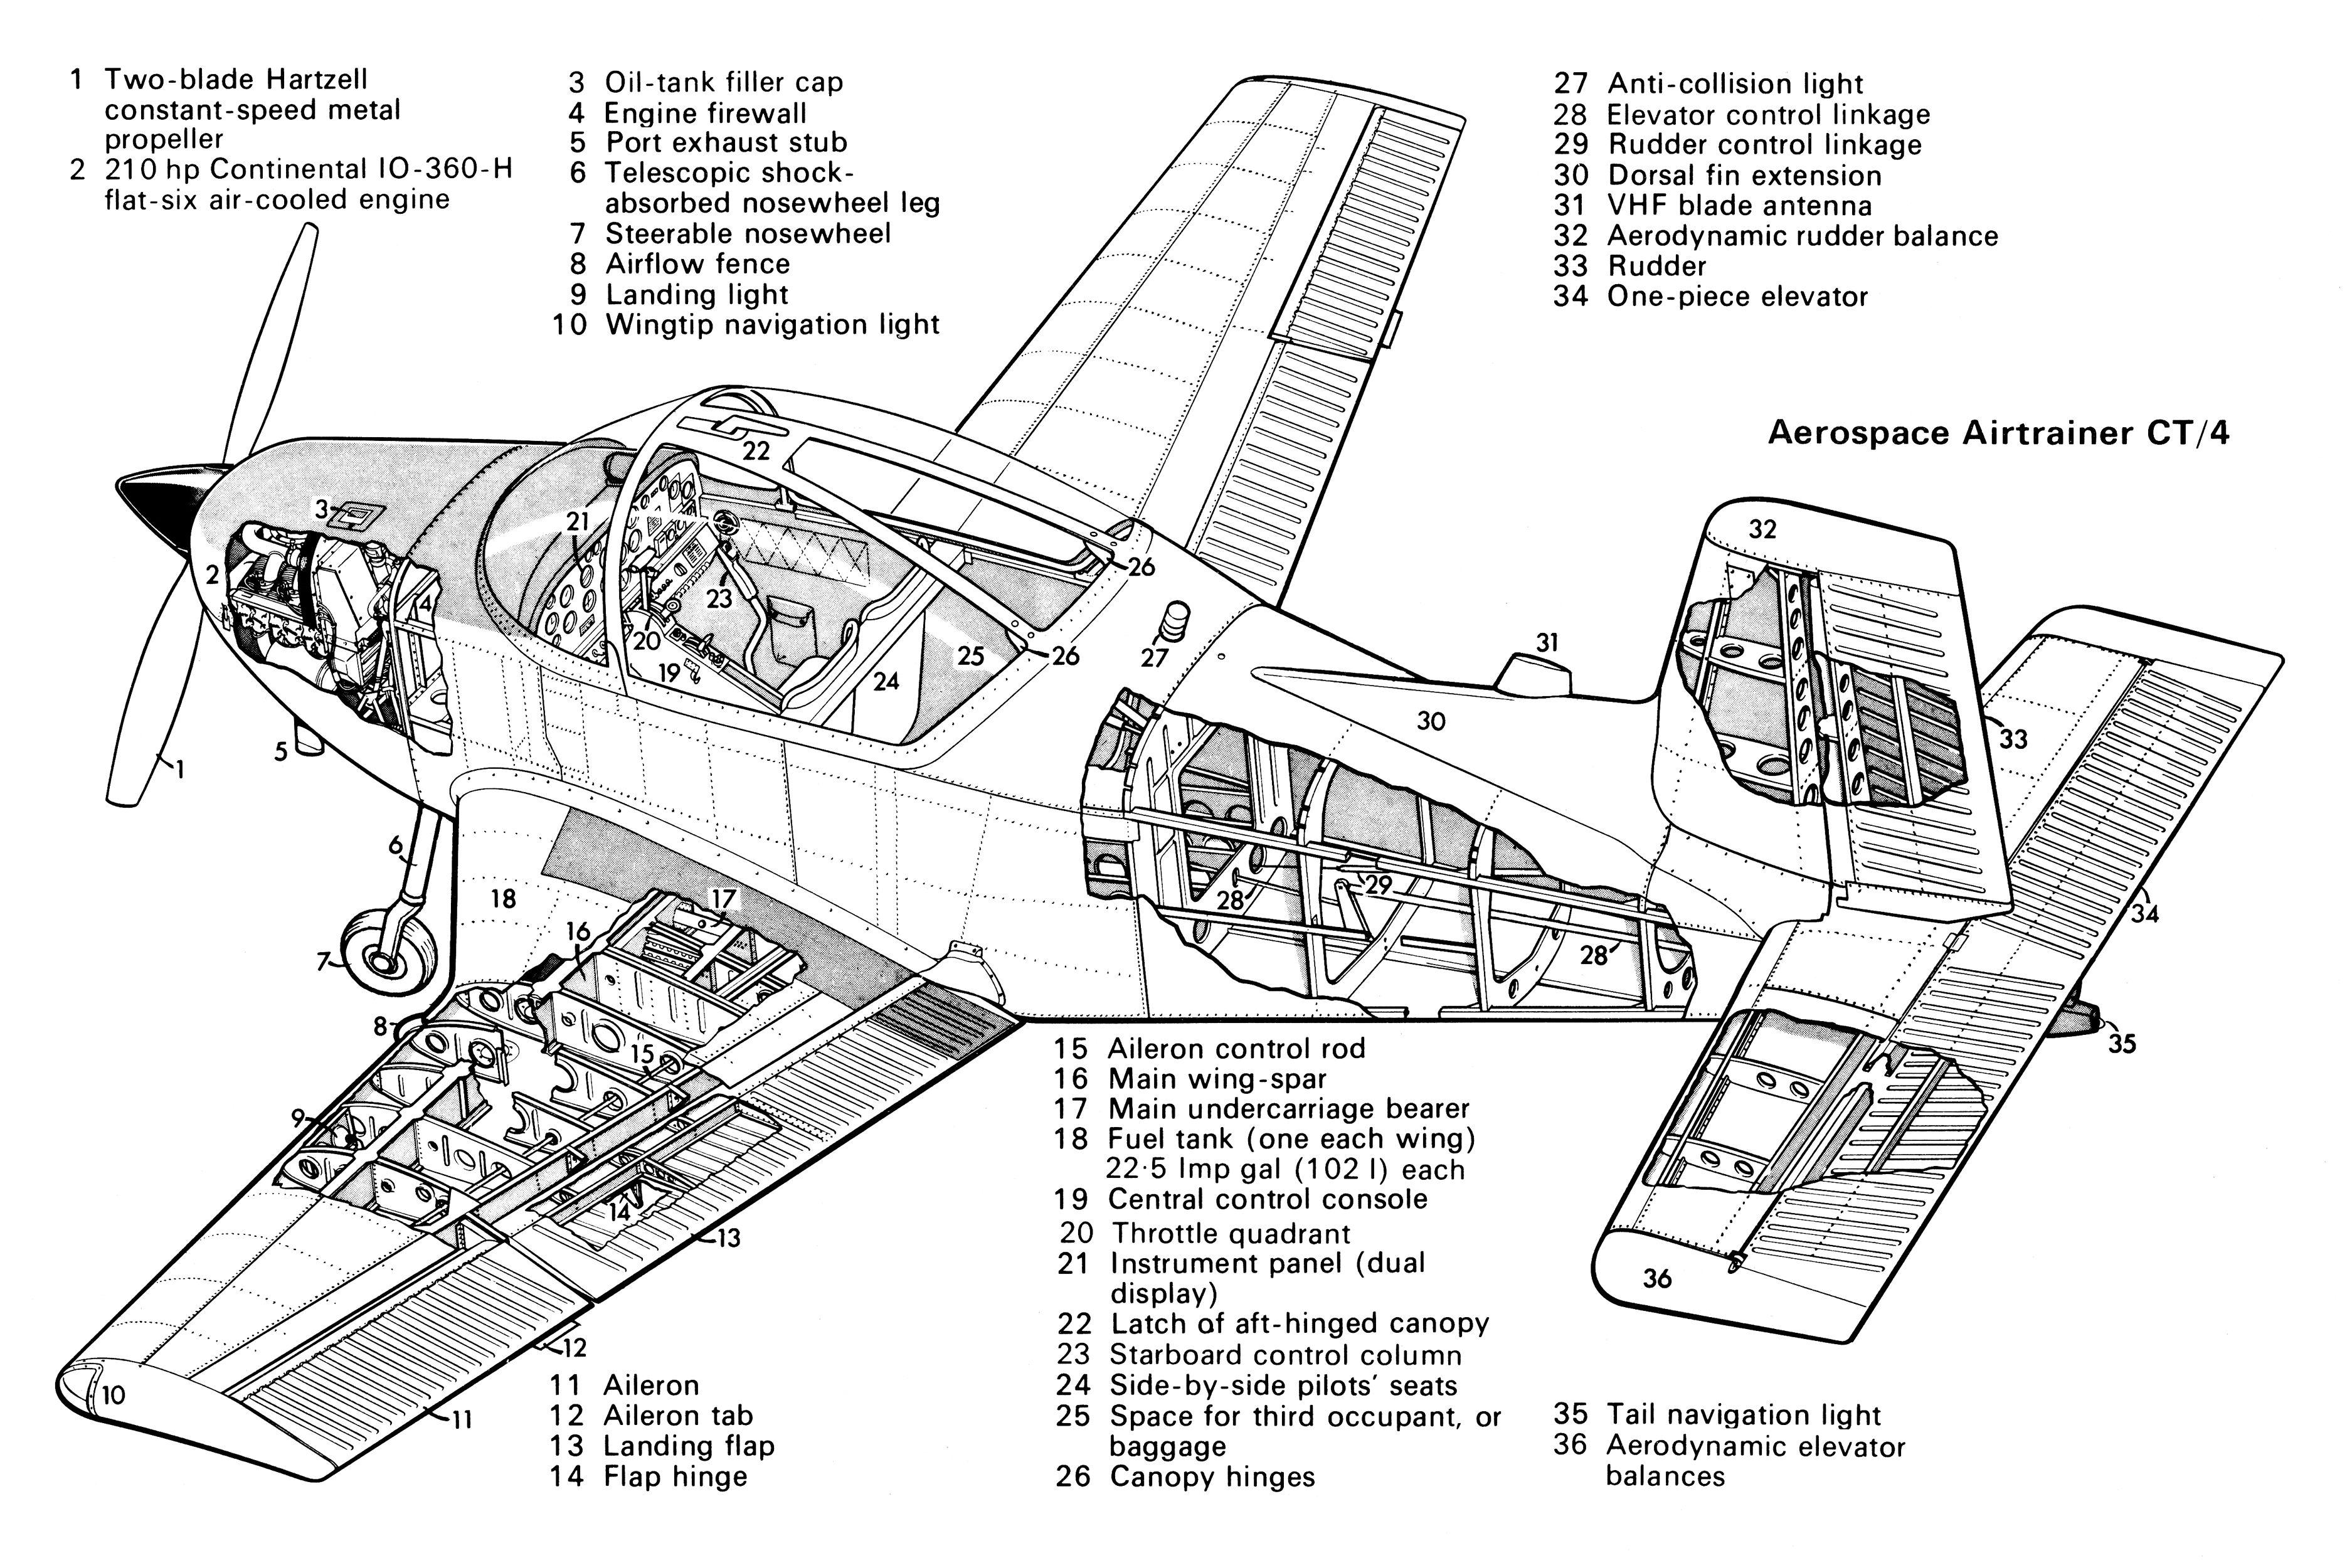 Aerospace Corporation Airtrainer Ct 4